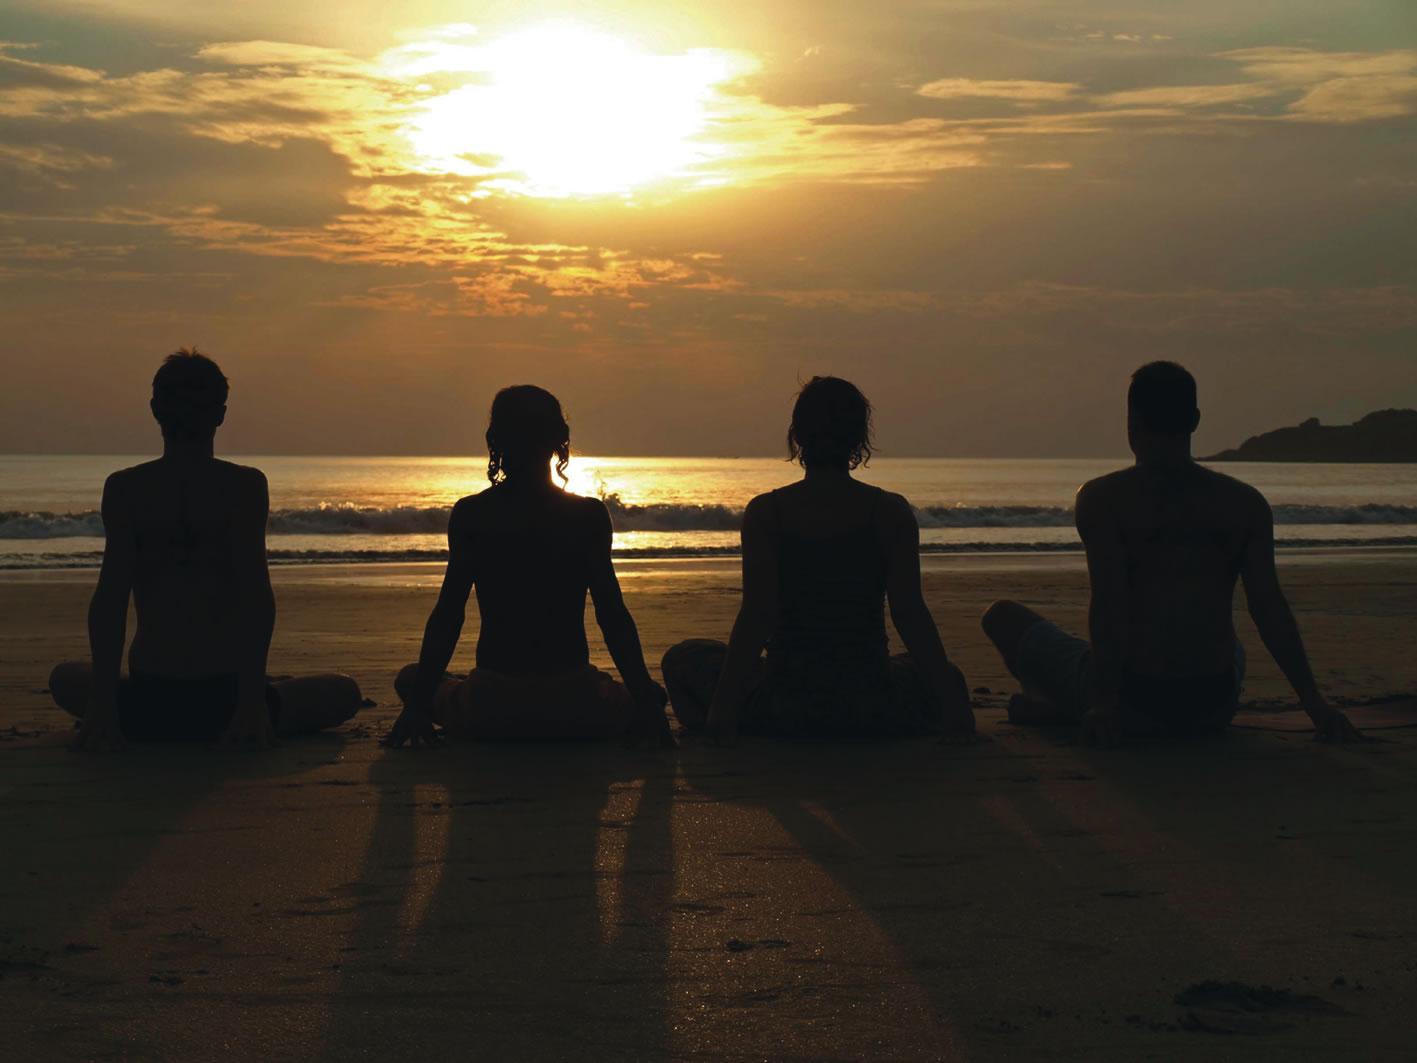 meditation-on-beach_alchemy-of-light.jpg